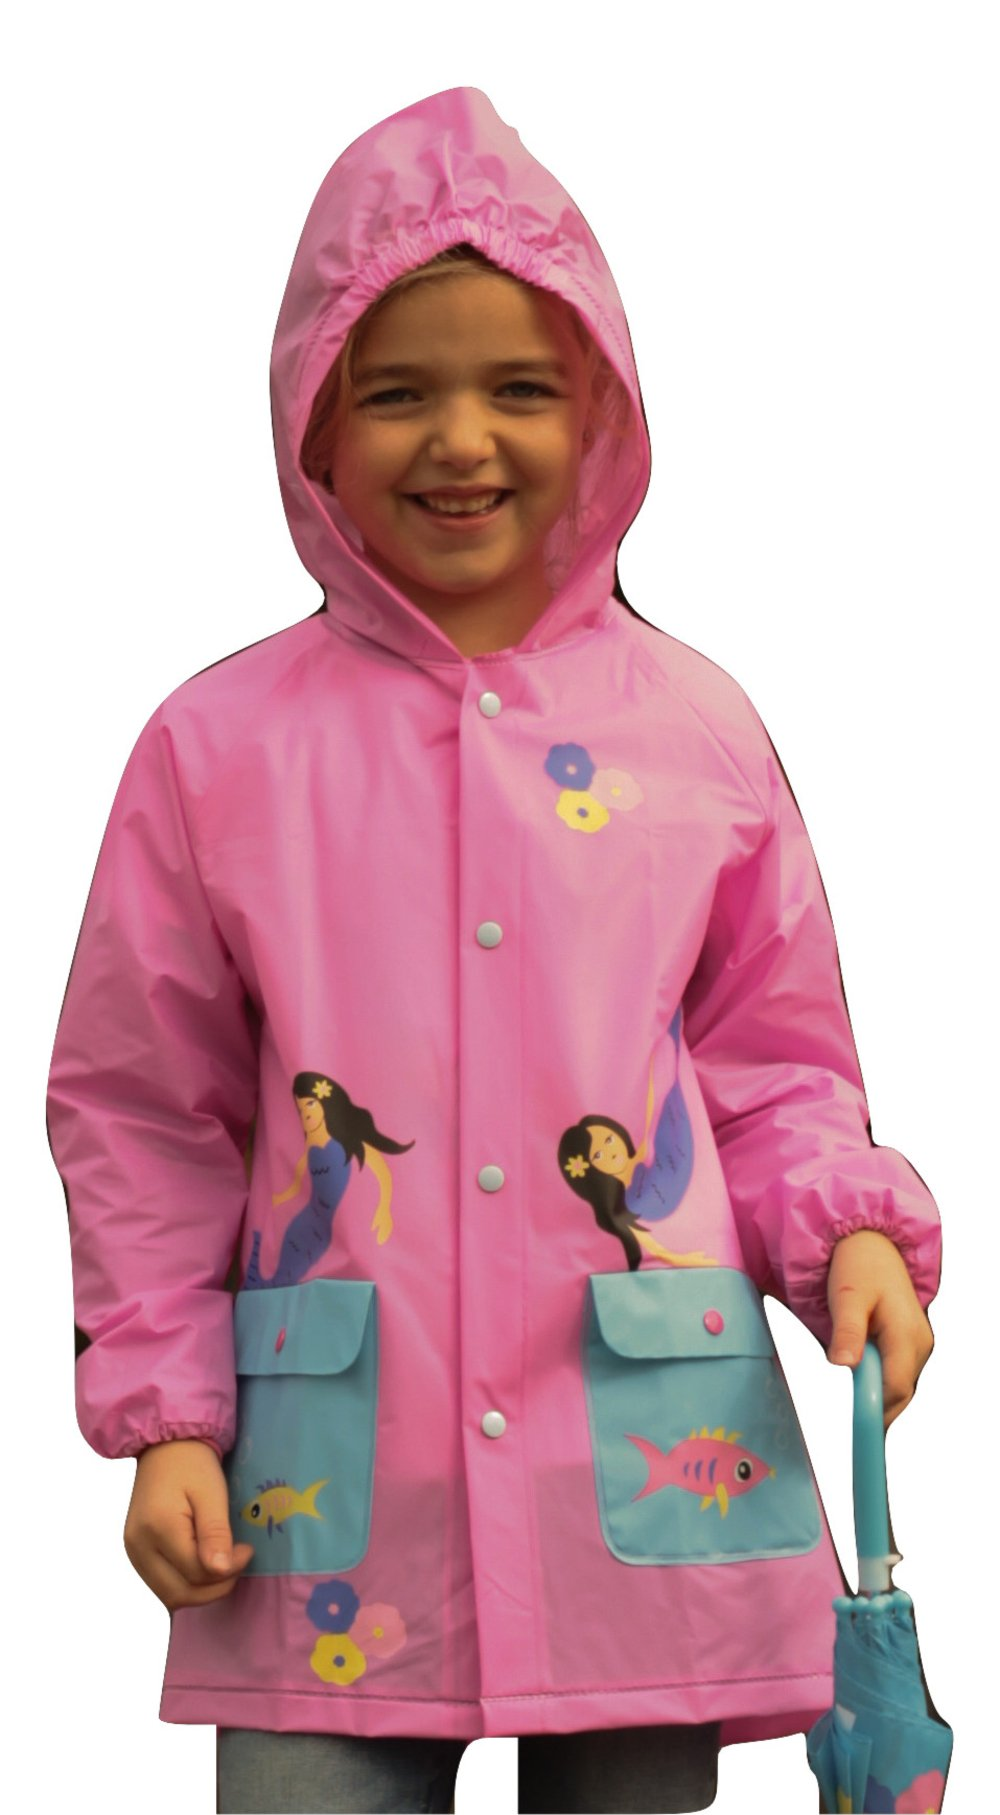 Kid's Rain Jacket: Rain Coat for Boys, Girls & Toddlers, with Fun Colorful Prints, Little or Big Kids, Mermaid, Medium